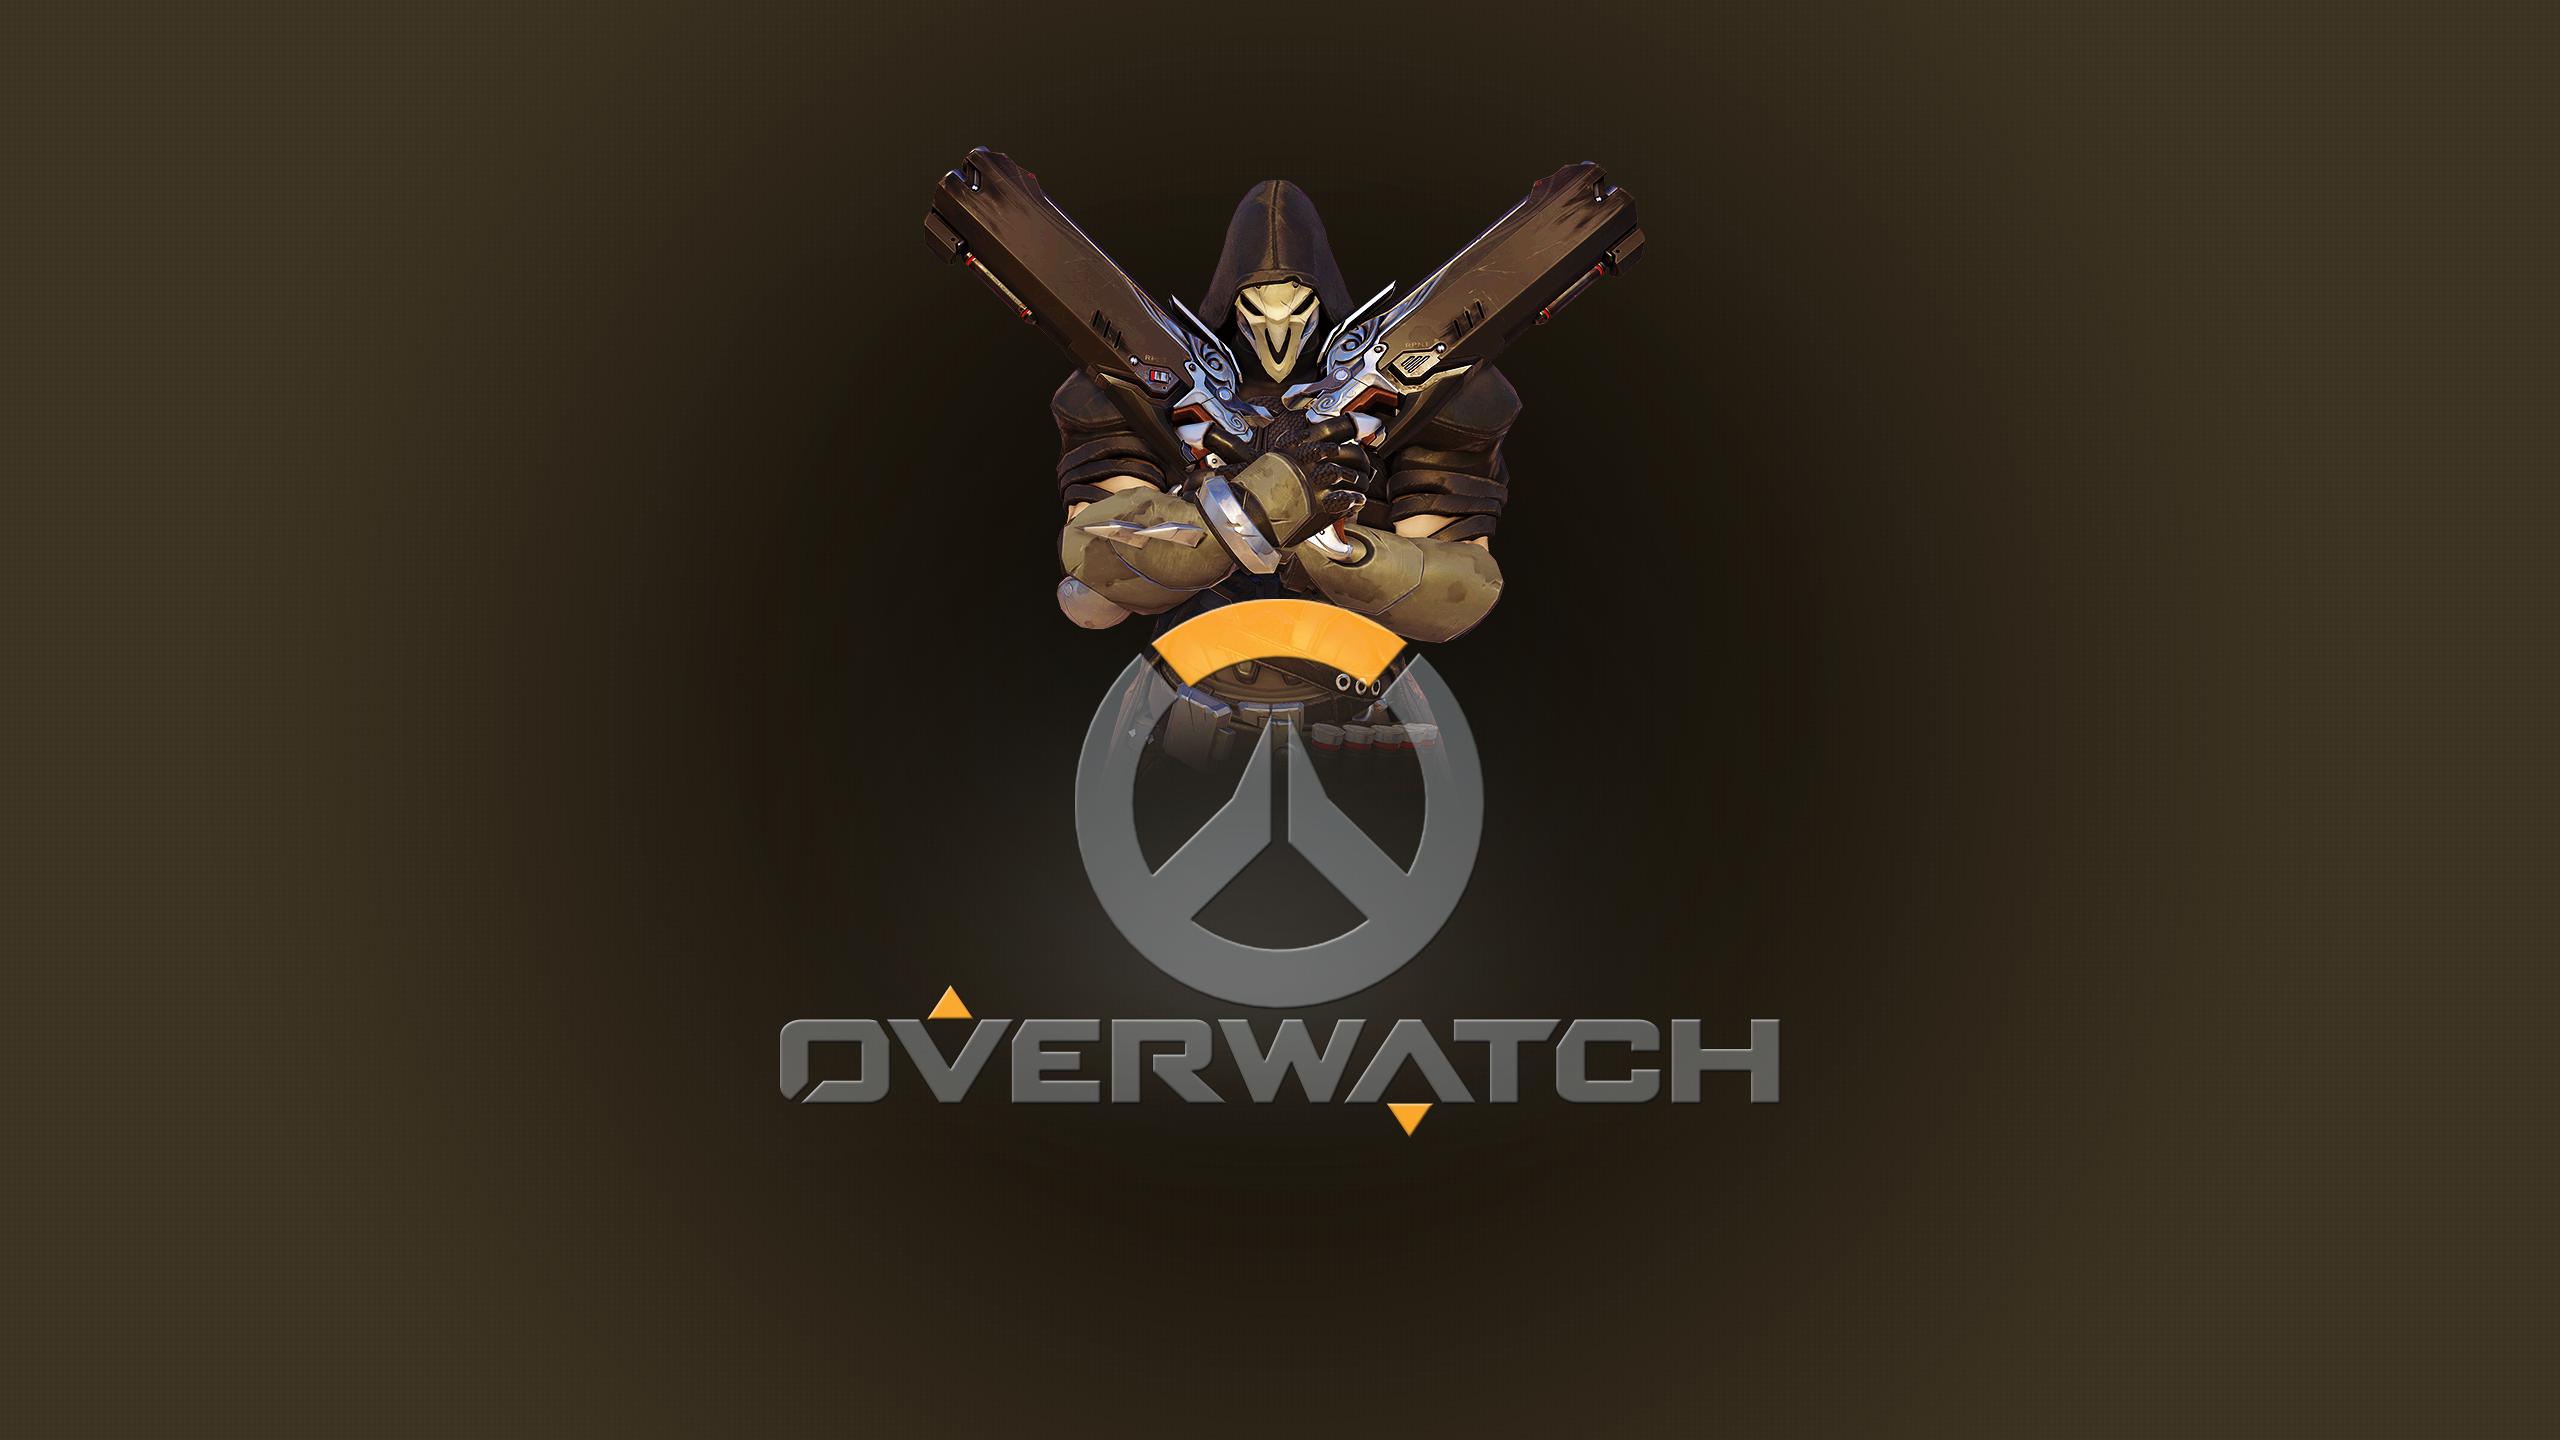 Simple Wallpaper High Quality Overwatch - video-games-logo-Overwatch-Reaper-Overwatch-Blizzard-Entertainment-brand-PT-Desu-Author-hand-screenshot-computer-wallpaper-53845  Snapshot_444064.png